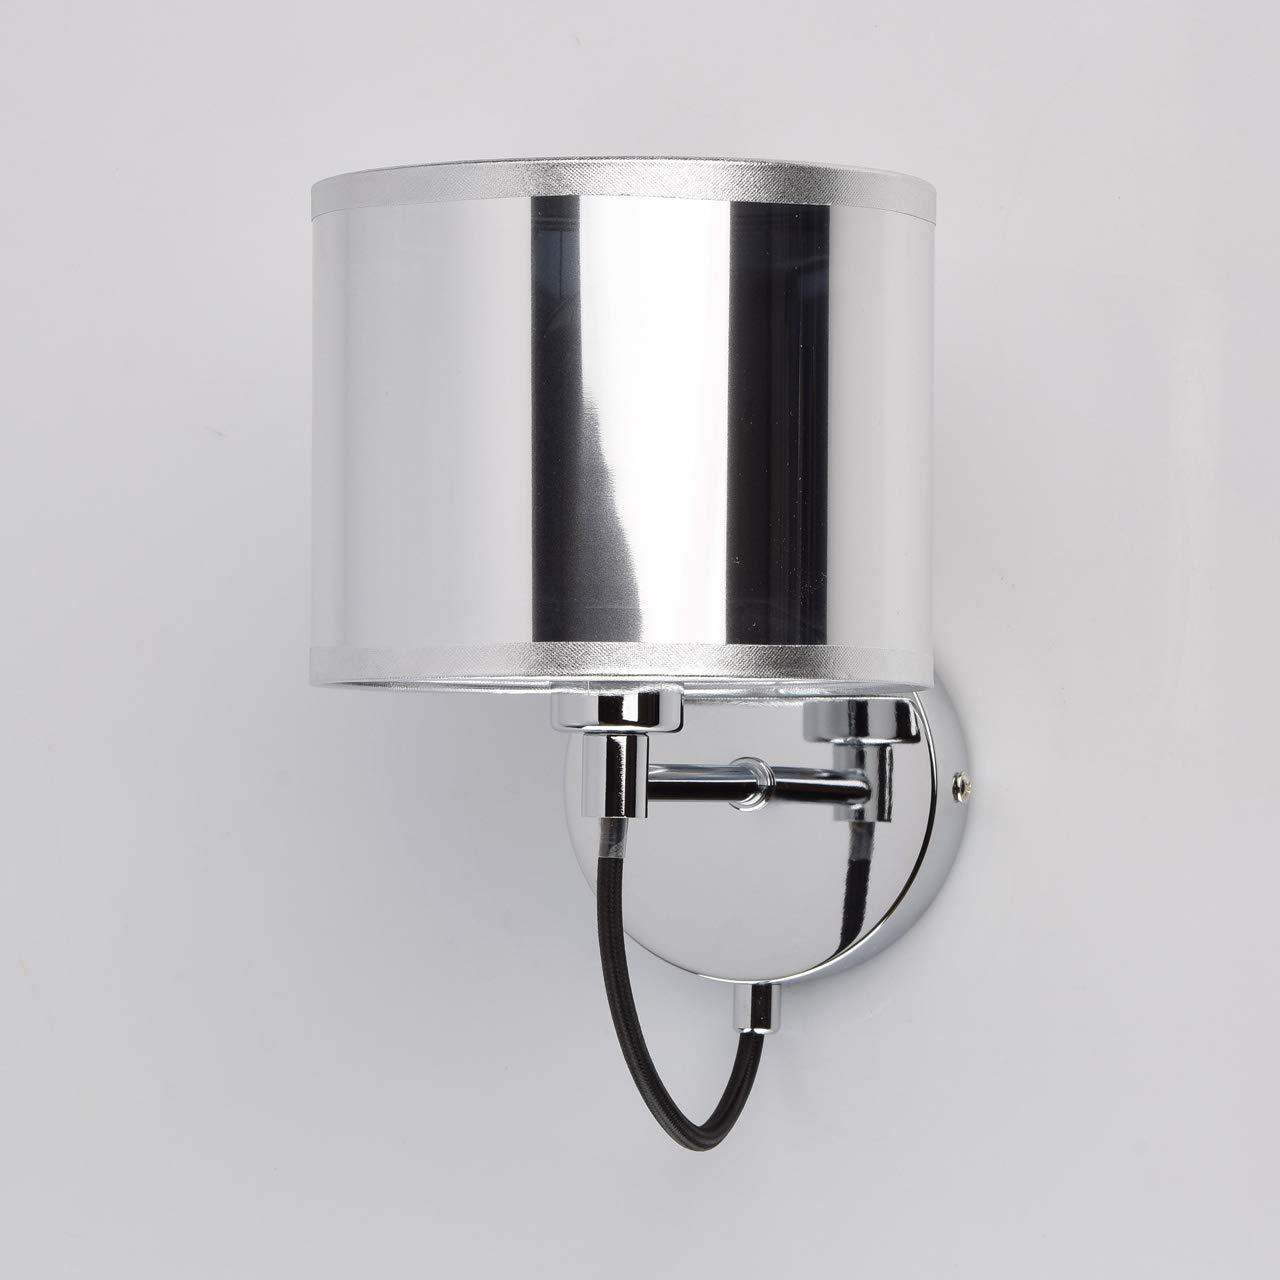 MW-Light 267021901 Wandleuchte Chrom 1 Armig Modern Glasschirm Wei/ß Wohnzimmer